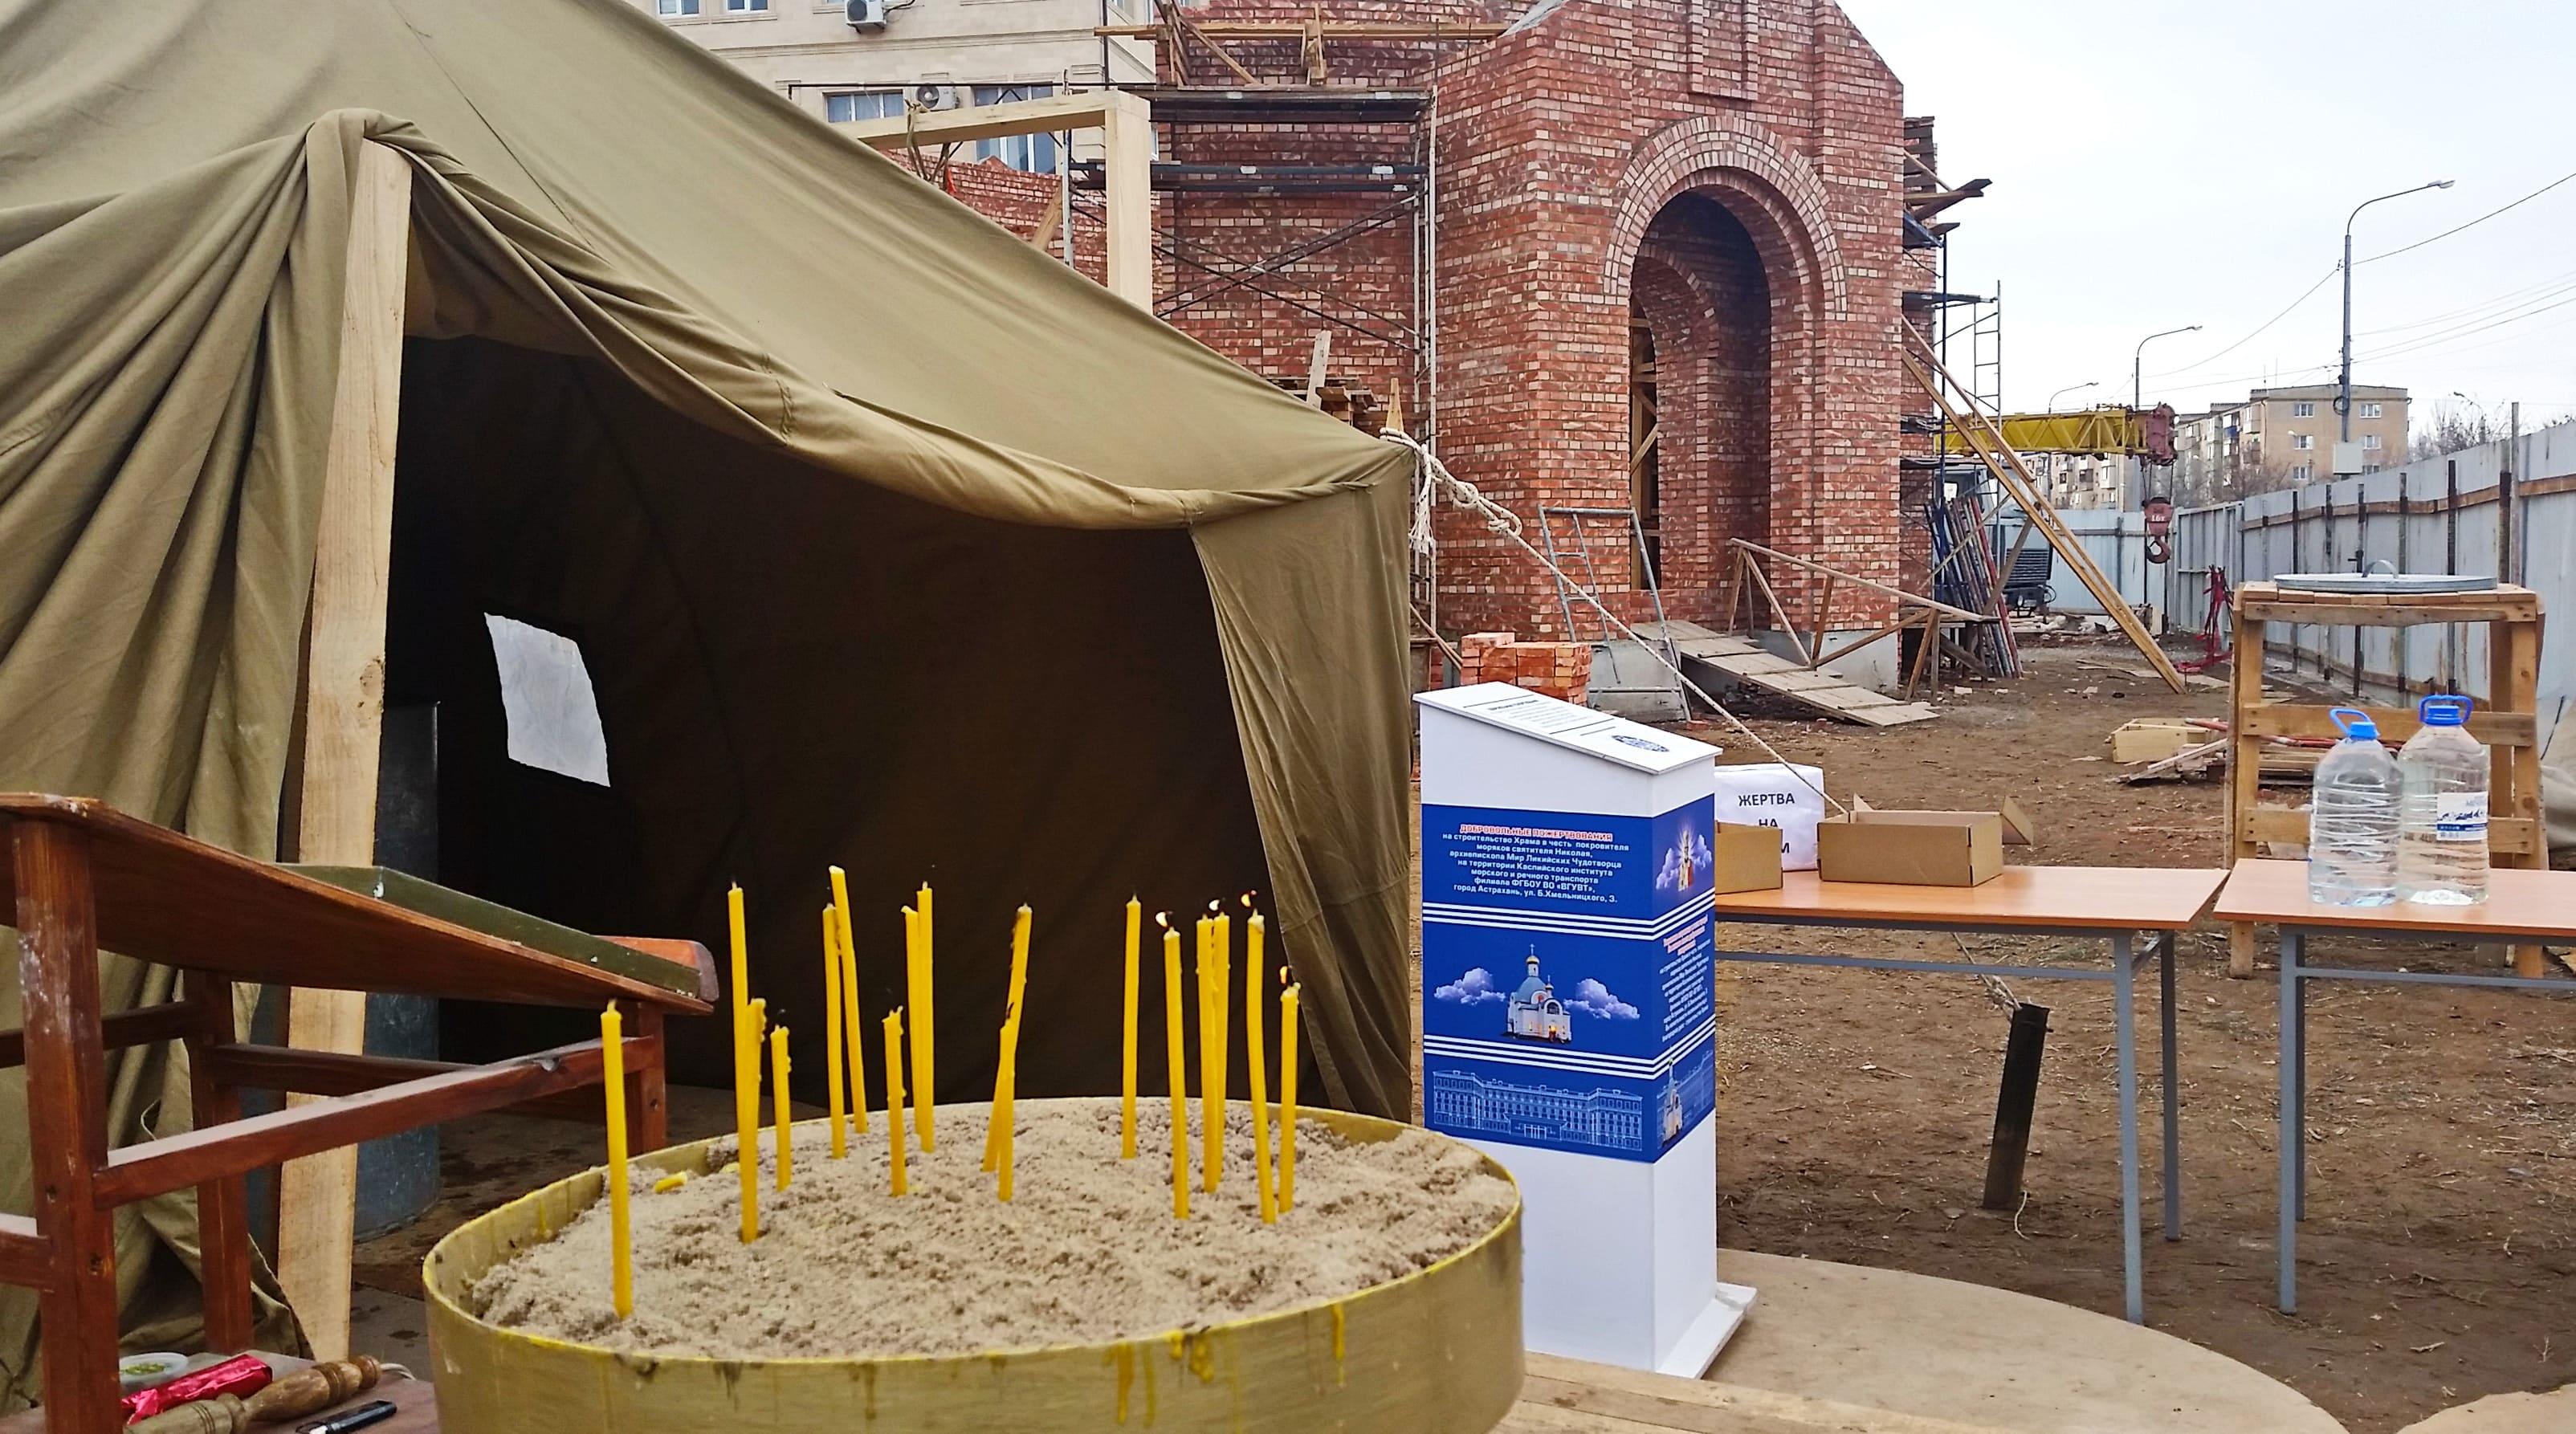 Праздничное богослужение на территории строящегося храма святителя Николая Чудотворца при КИМРТ